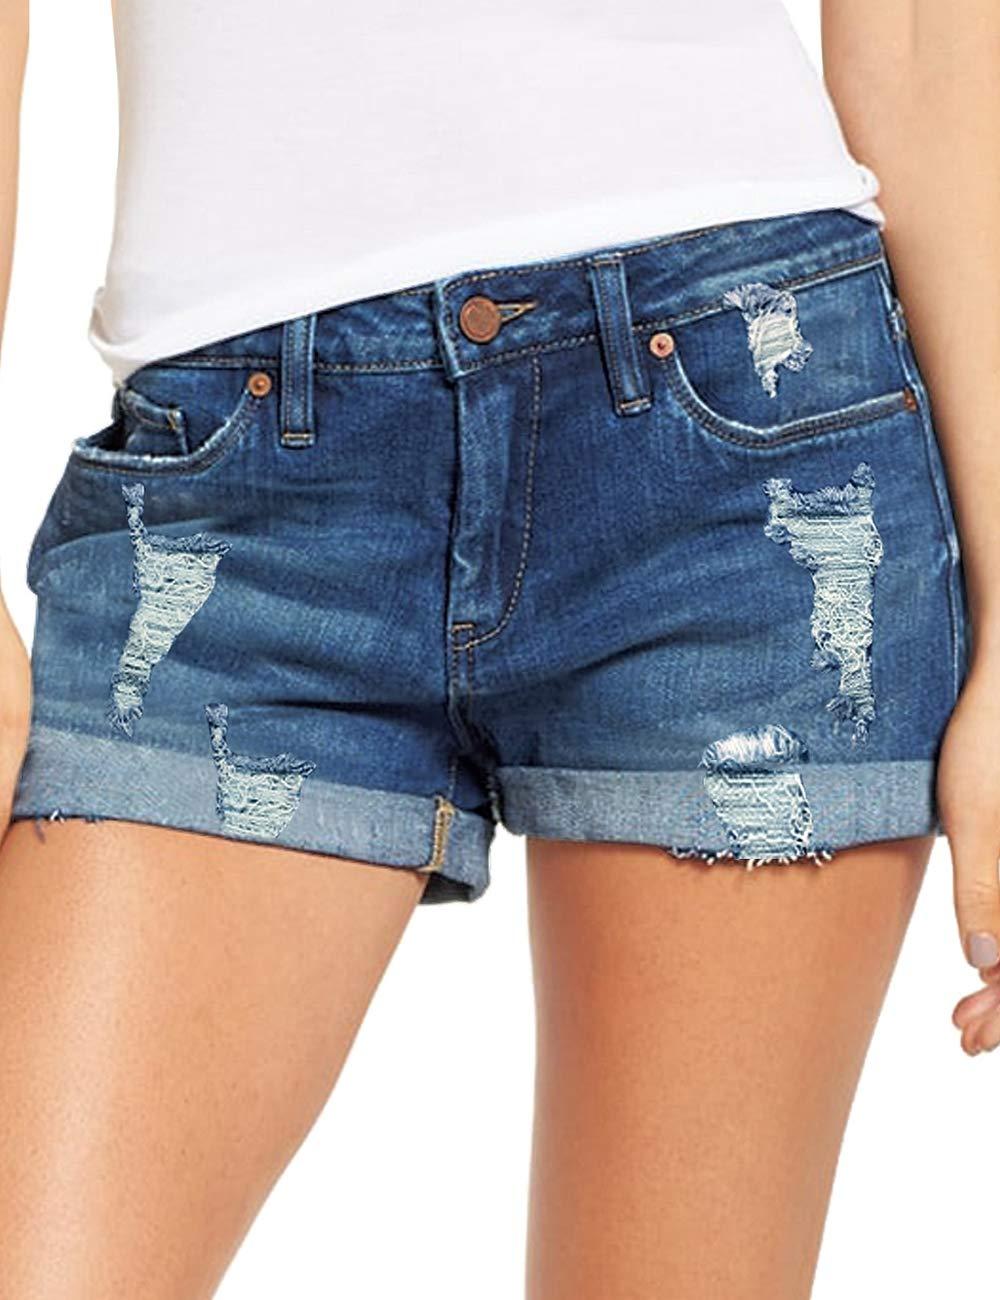 eeac0a5096 Women's Rolled Hem Distressed Jeans Ripped Denim Shorts - Denim Fit